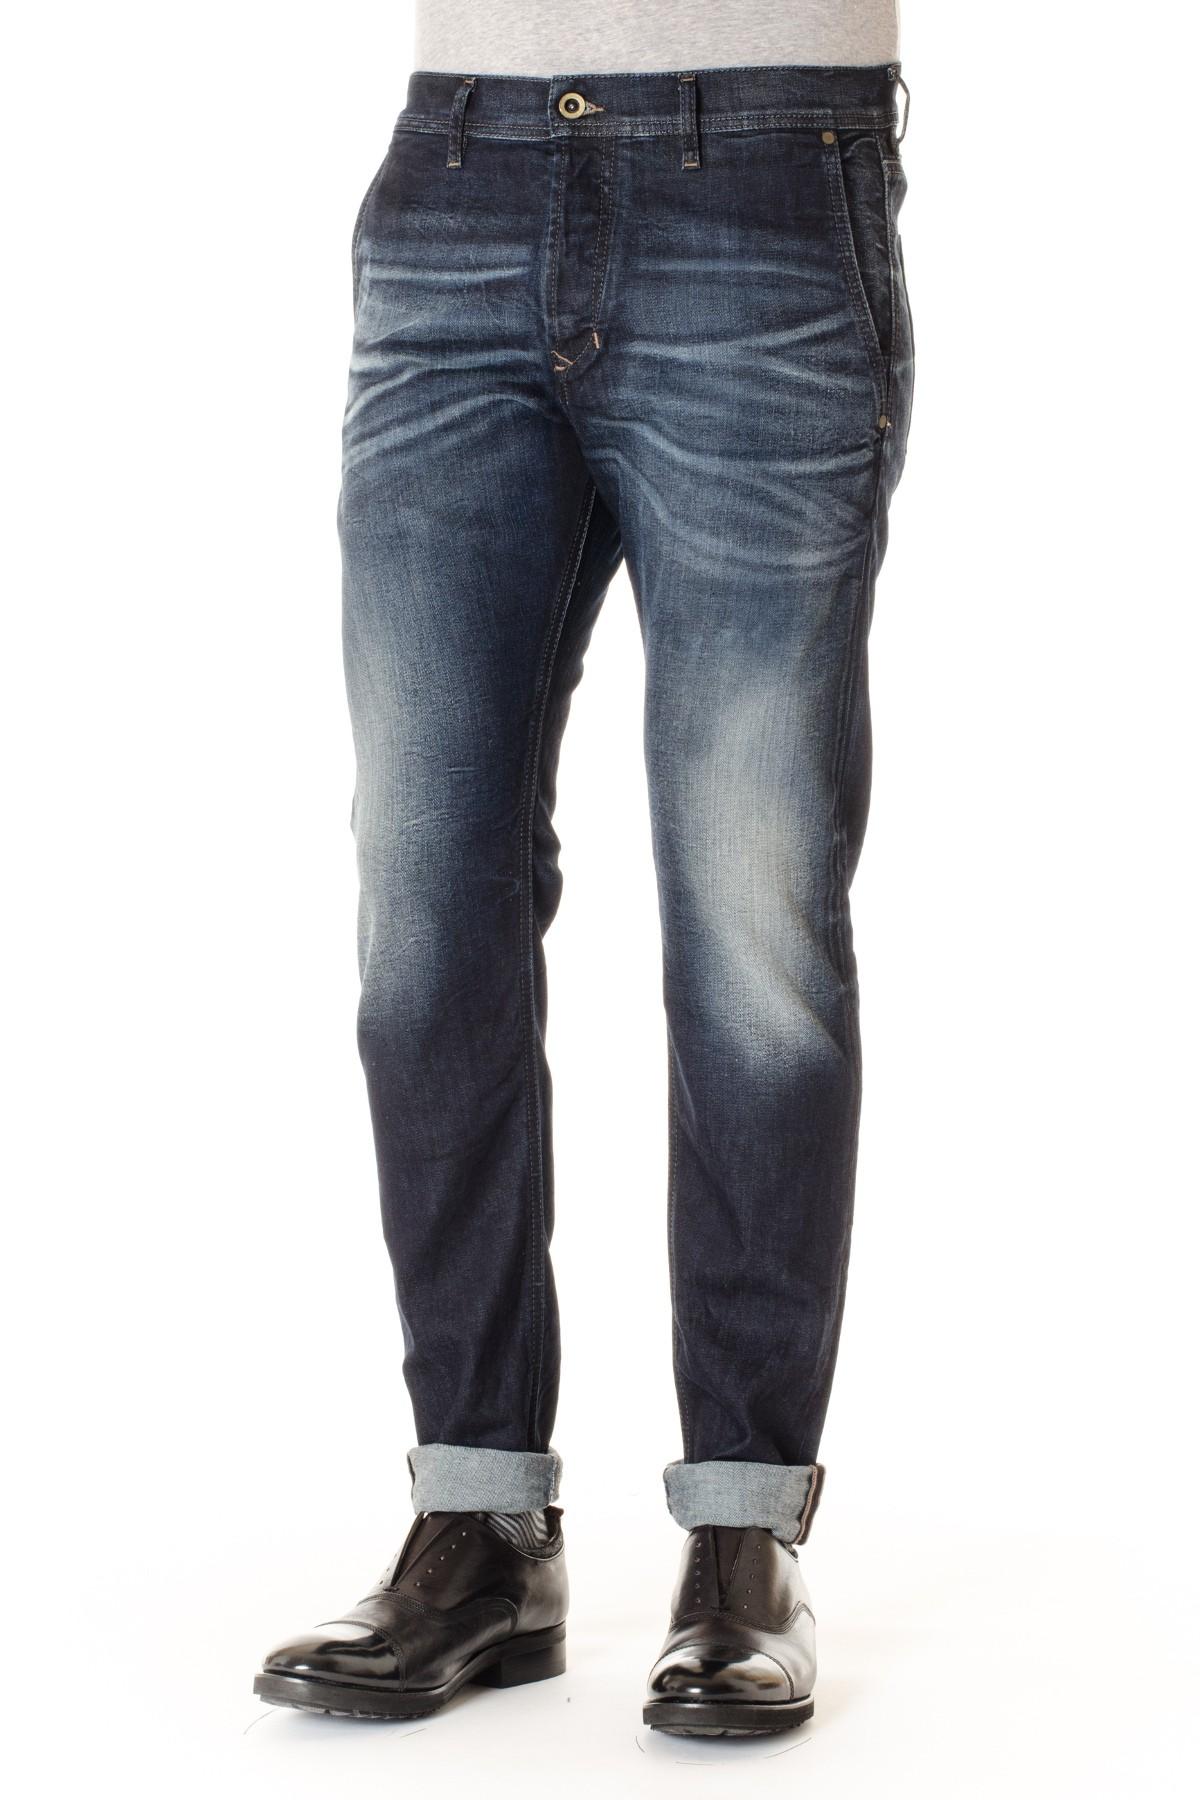 best website 104db 5d2cc DIESEL Jeans denim KAKEE for men F/W 16-17